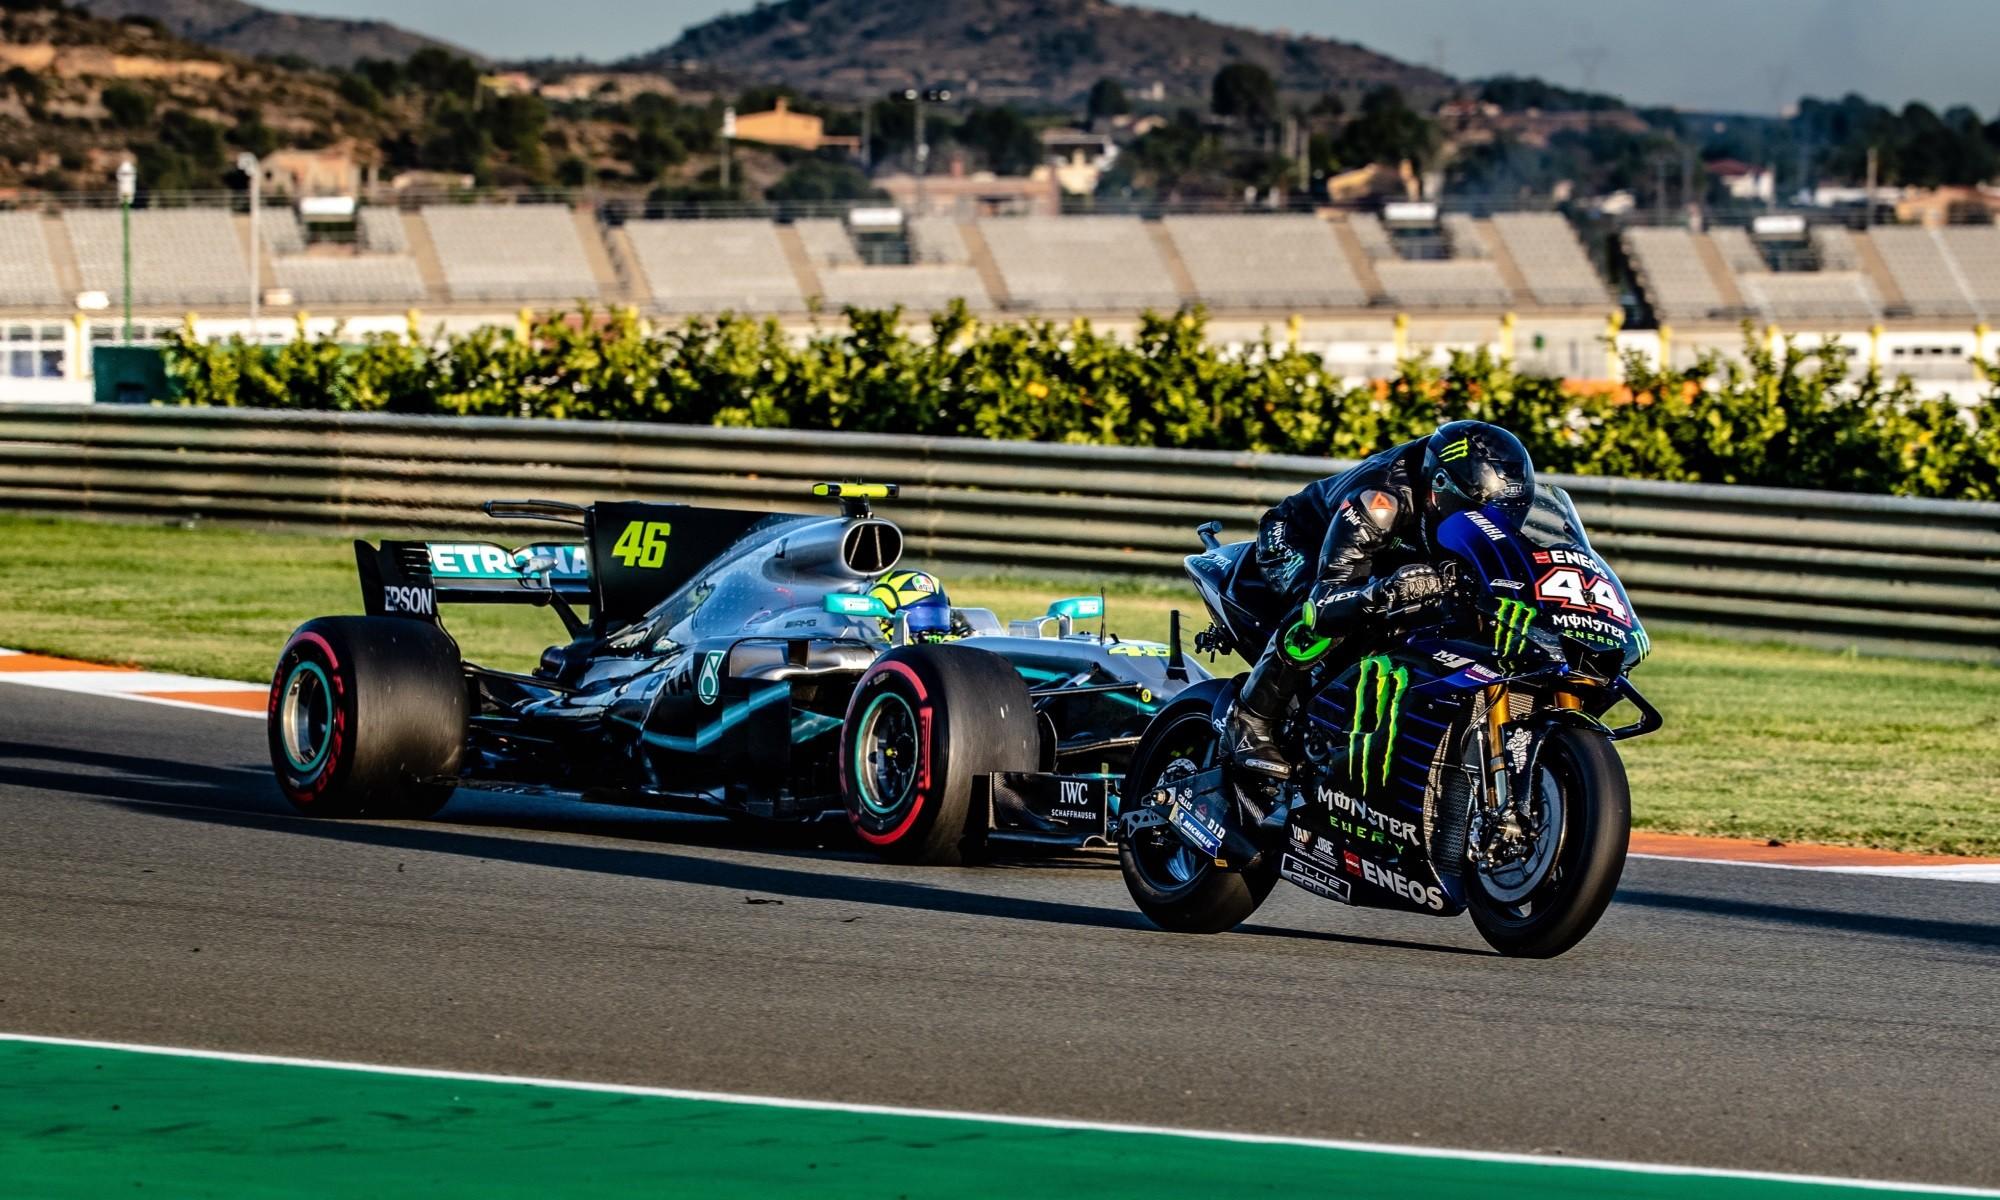 F1 vs MotoGP